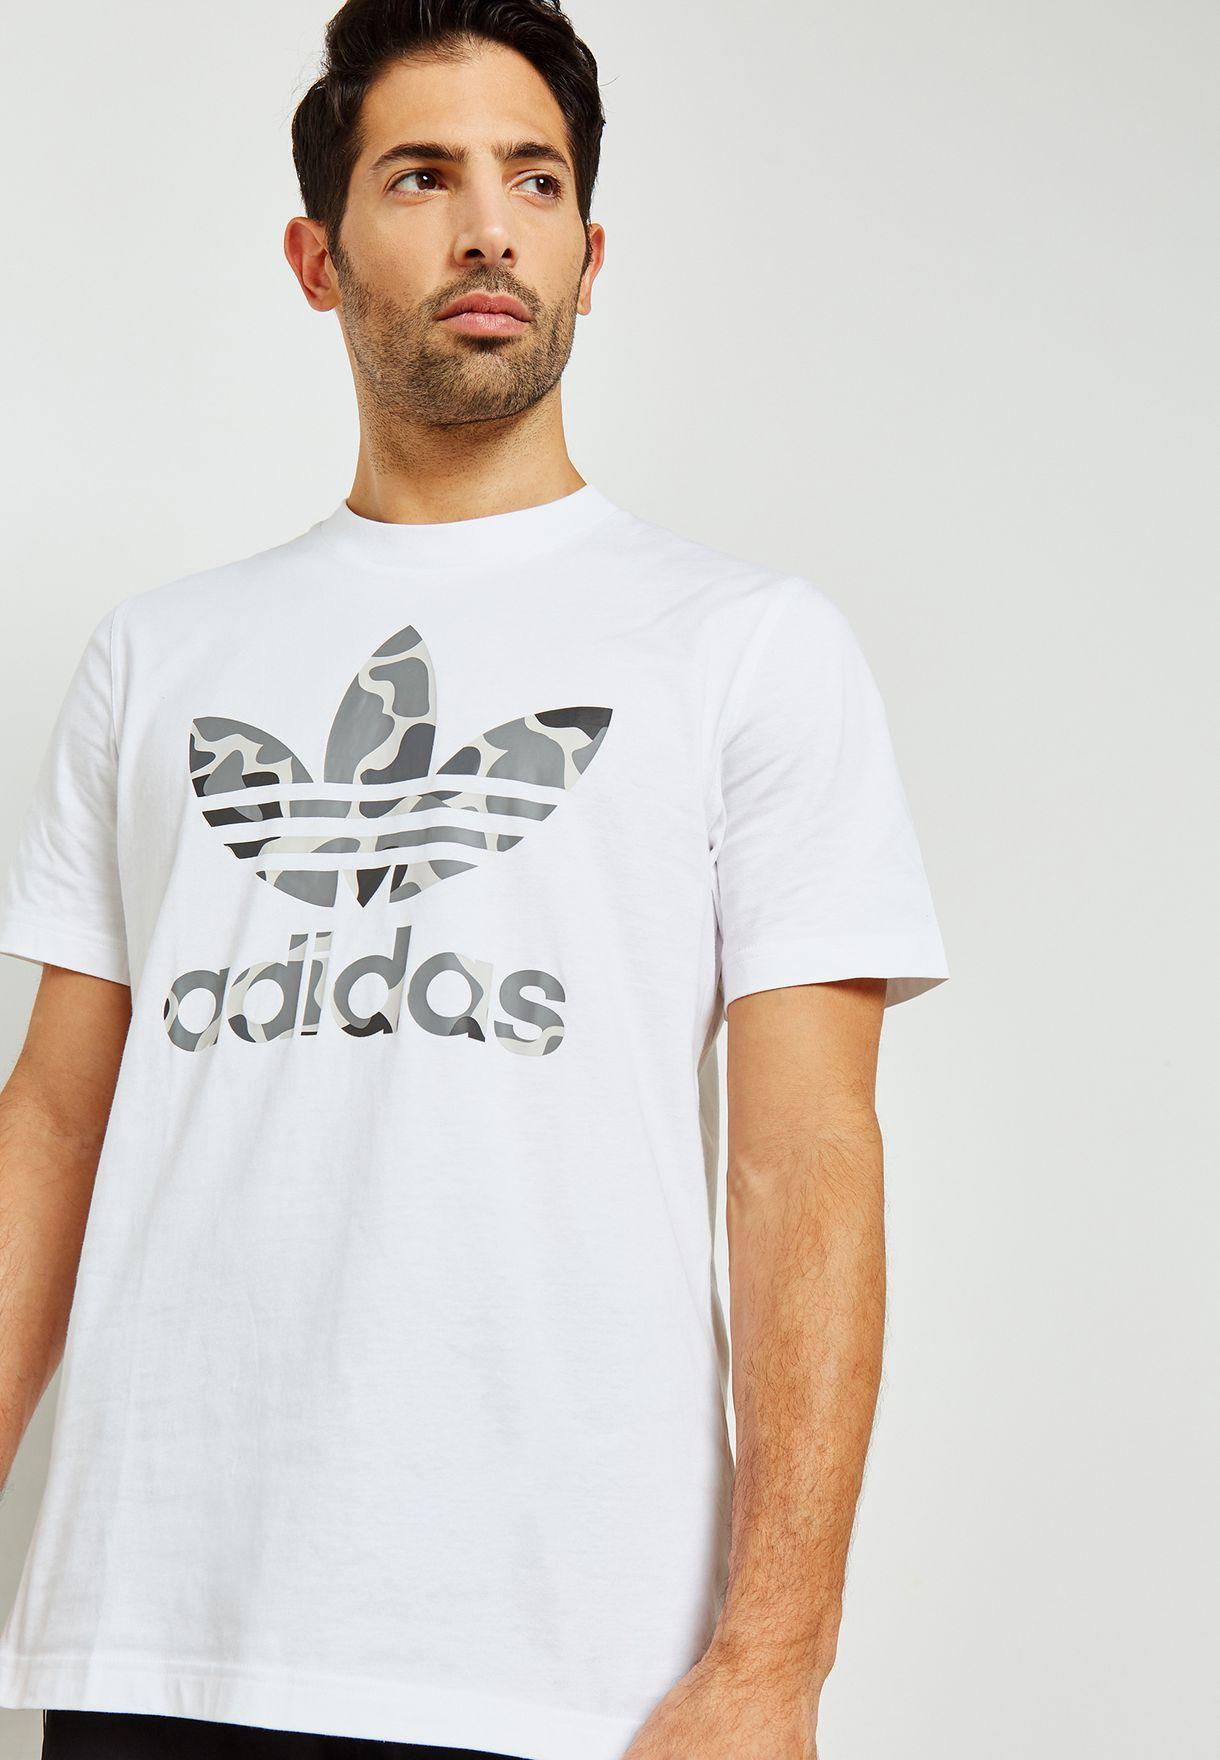 e14bee4e0dac Shop adidas Originals white Camo Trefoil T-Shirt DH4767 for Men in Saudi -  AD478AT20WQT